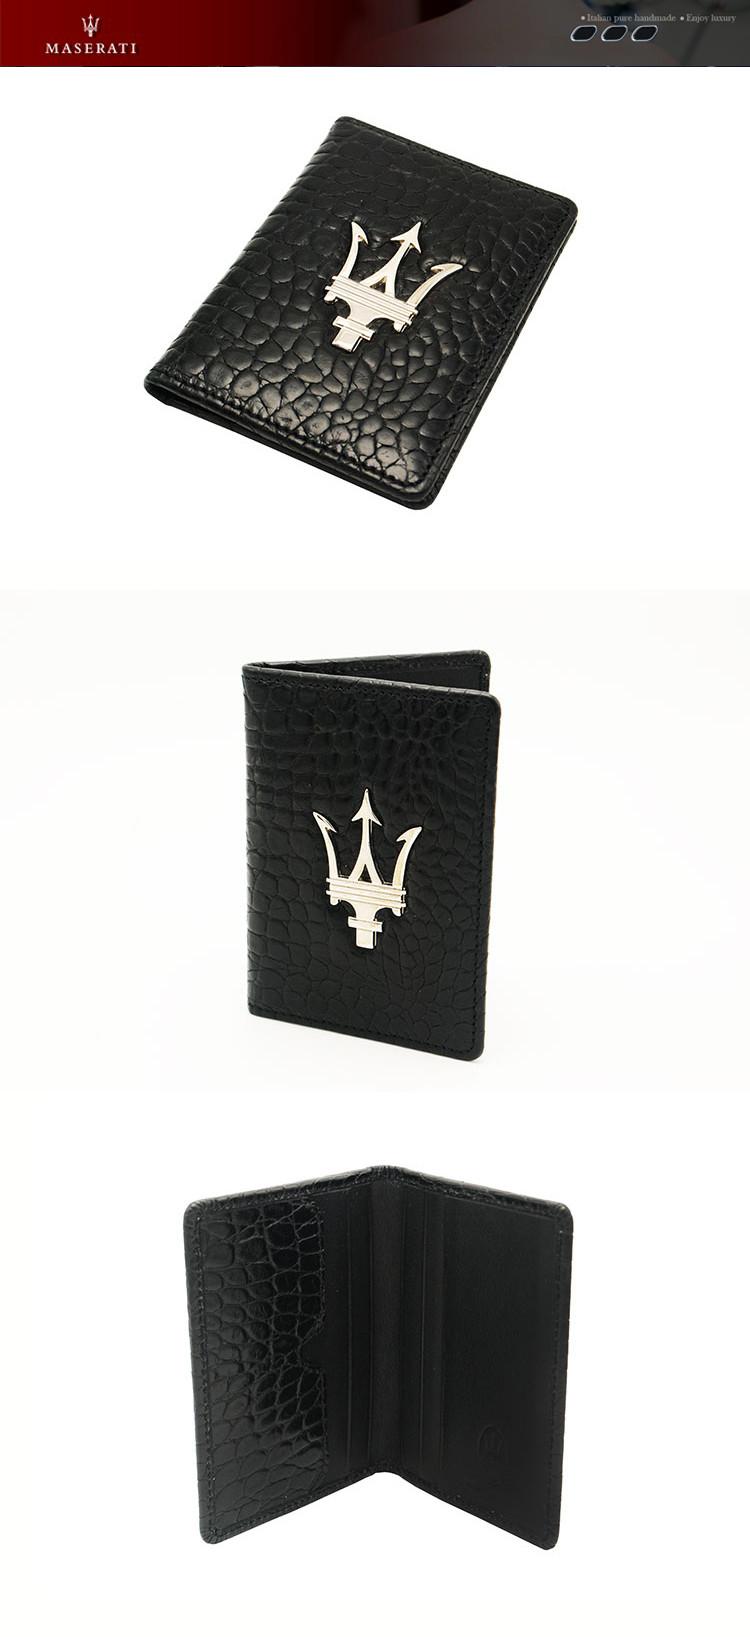 maserati玛莎拉蒂 意大利原产鳄鱼压纹大logo头层牛皮卡片夹